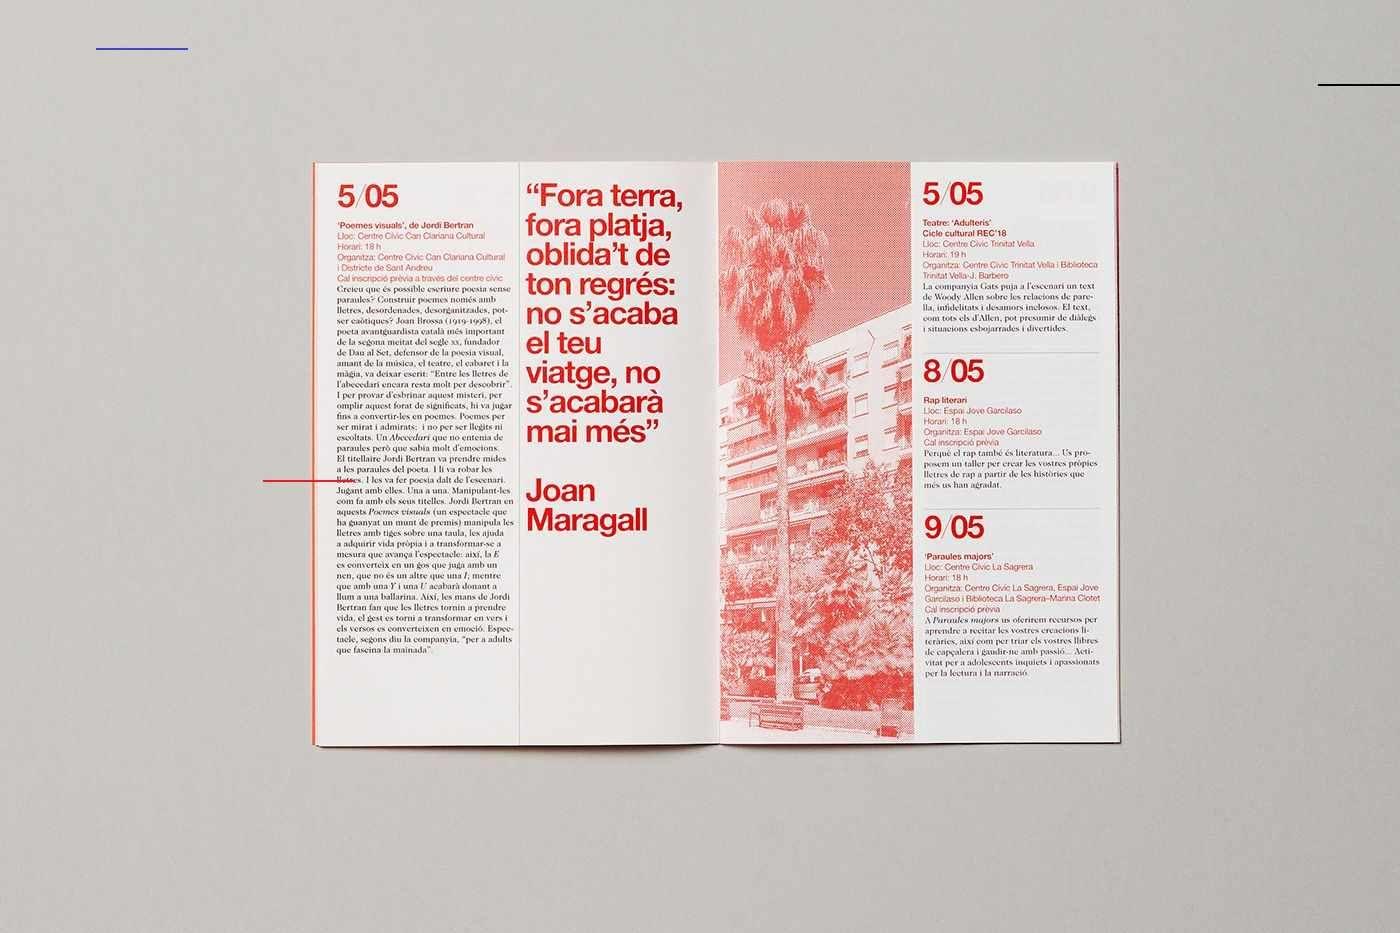 Calidoscopi Cultural 2018 Editoriallayout Broschurendesign Buch Design Broschure Design